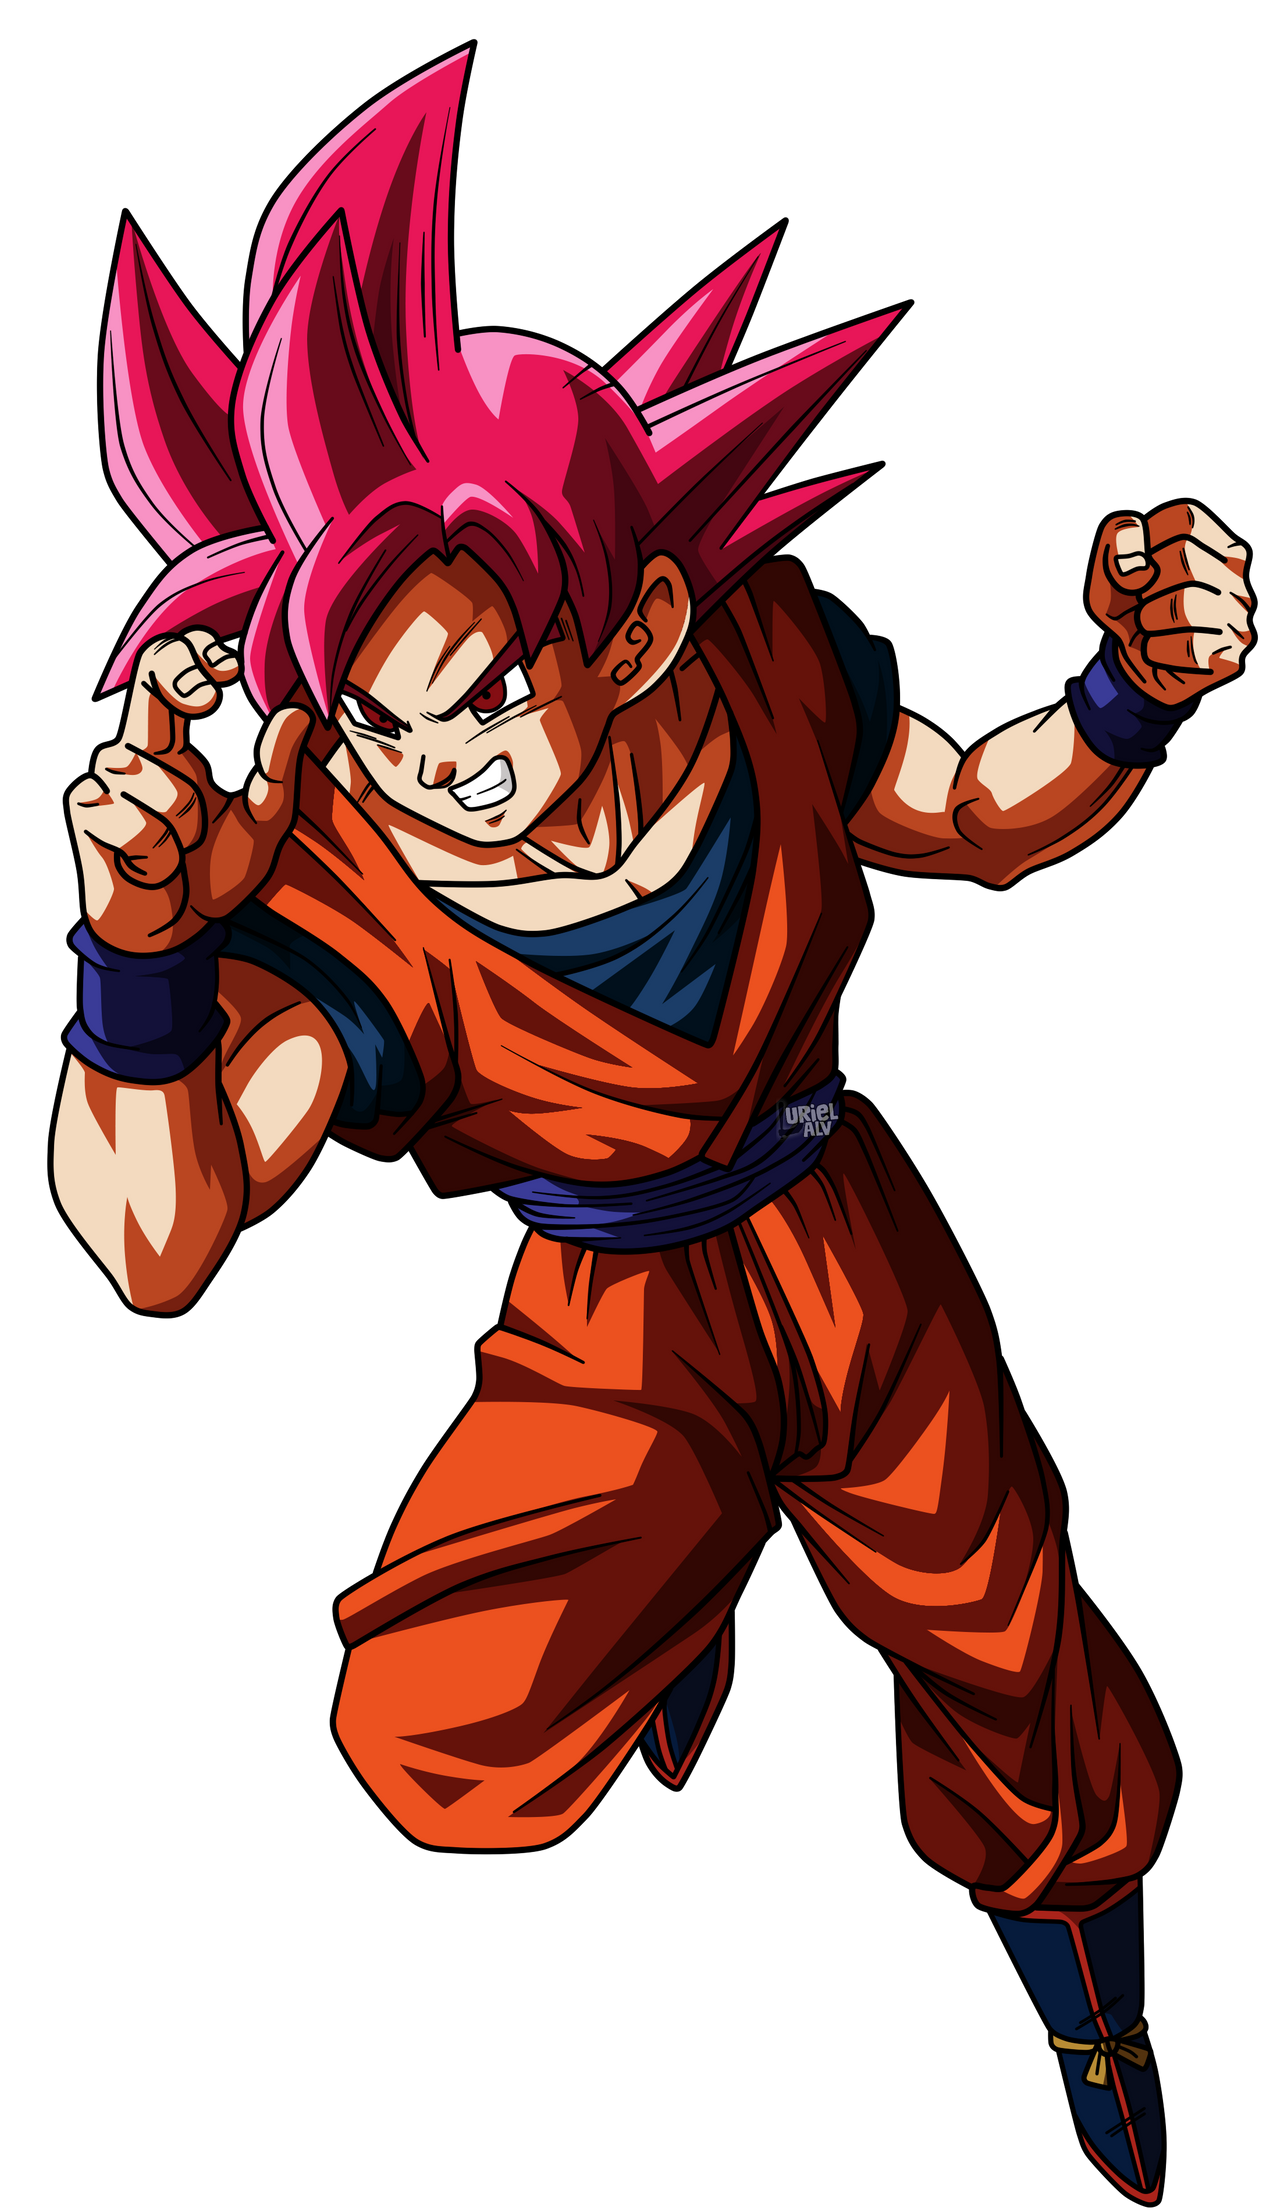 Goku Super Saiyajin Fase Dios By Urielalv On Deviantart Anime Dragon Ball Dbz Characters Anime Fan